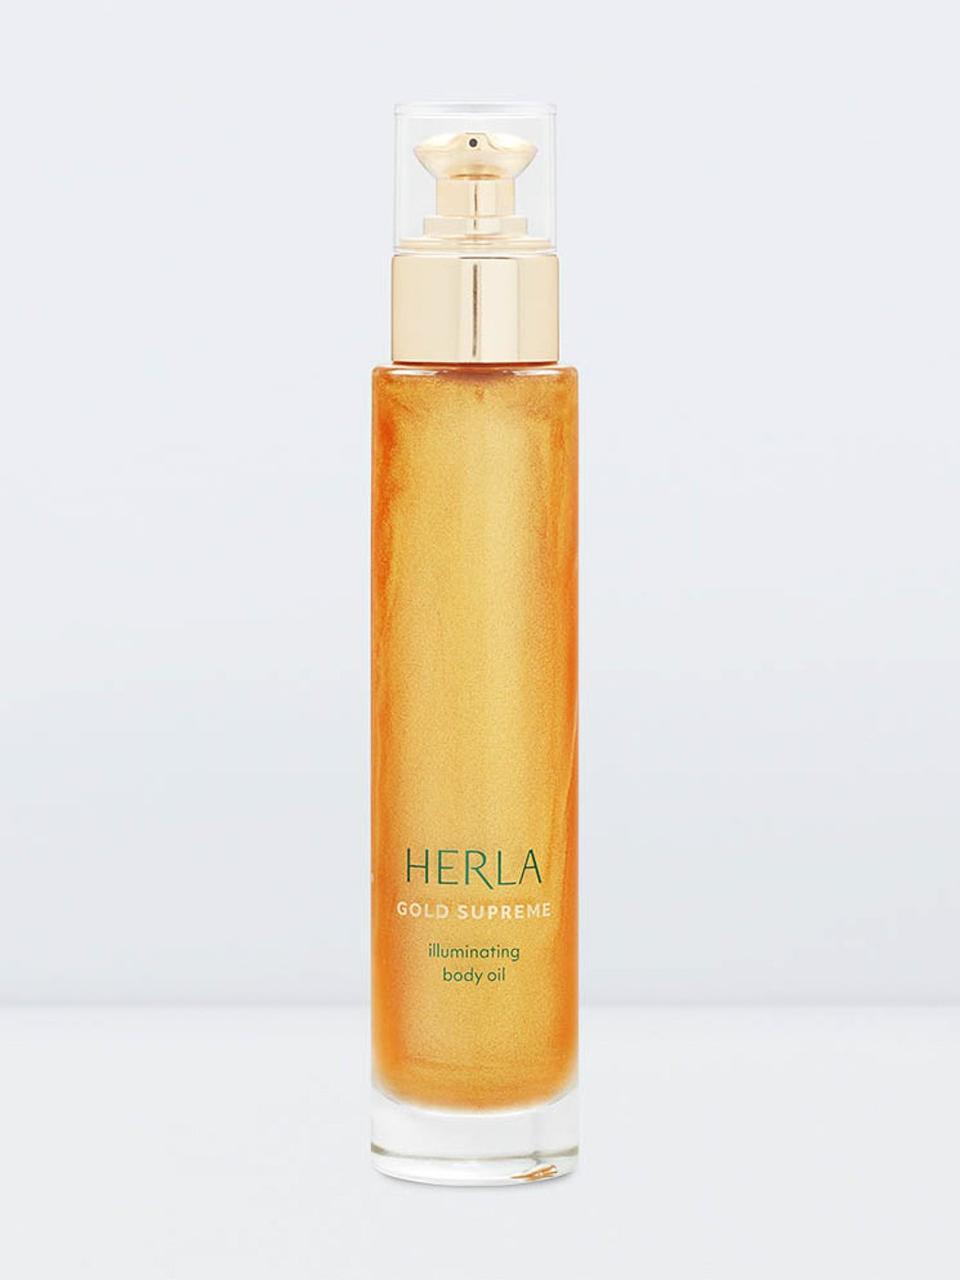 Herla Gold Supreme Illuminating Body Oil Gold Infused Skin Care Gifts